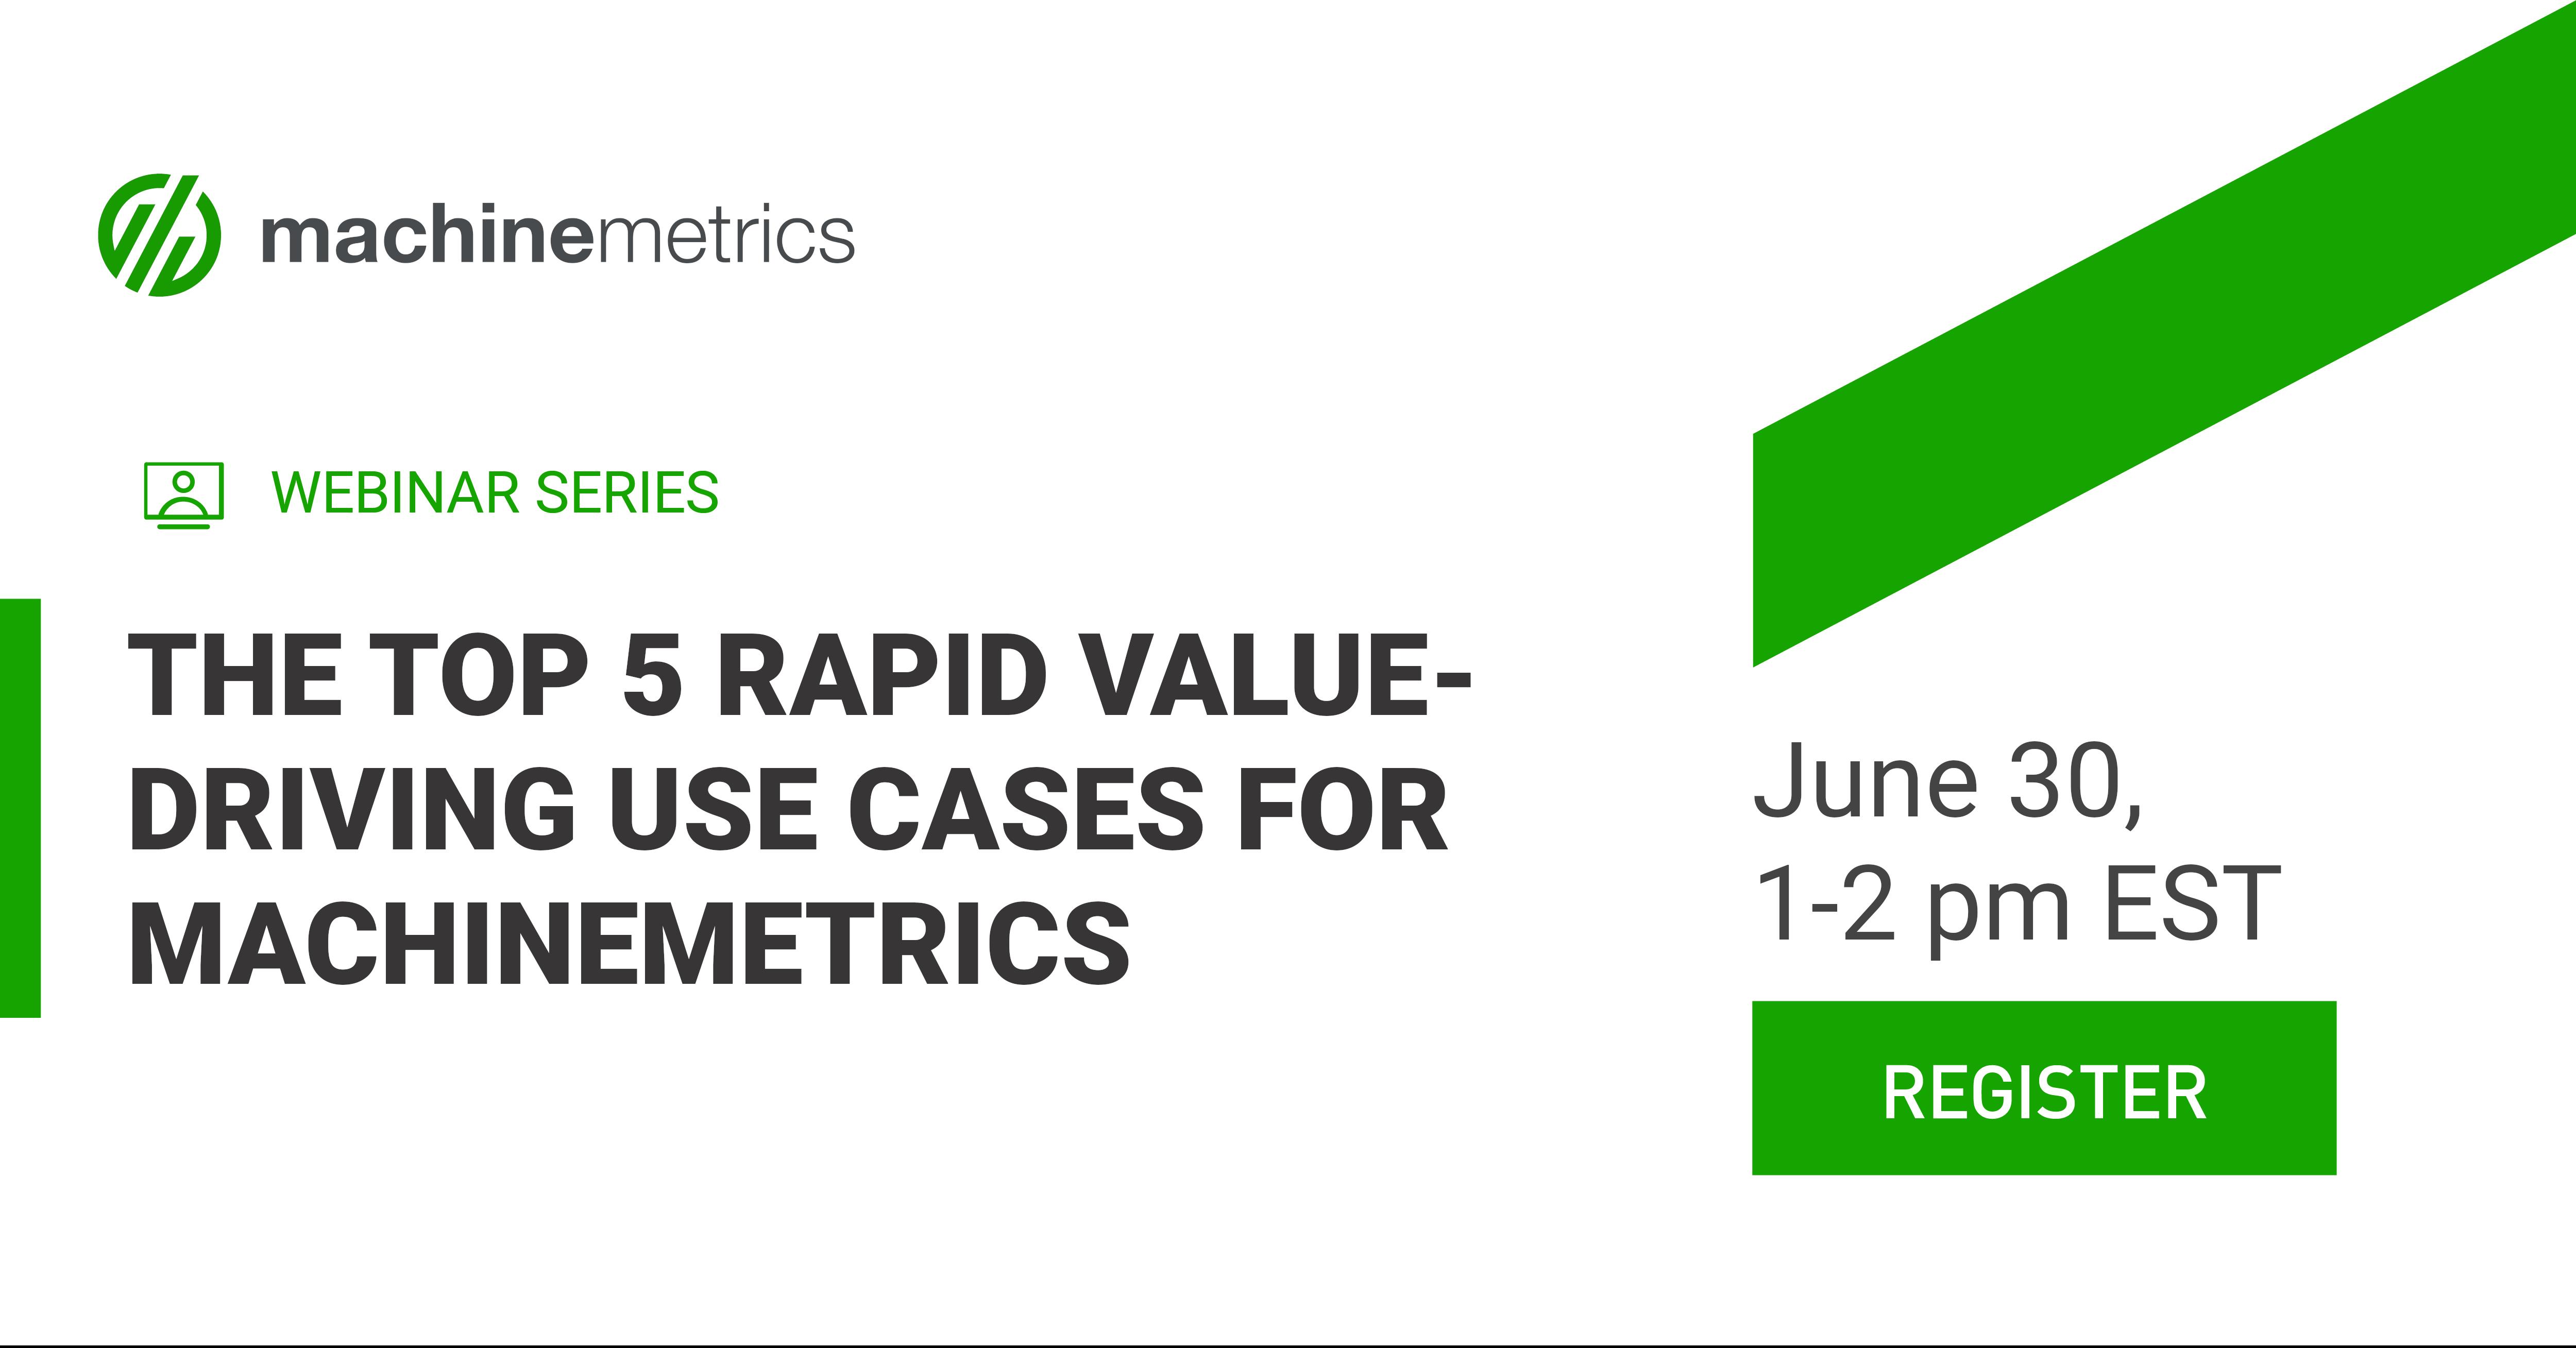 rapid-value-driving-use-cases-machinemetrics-webinar-meta